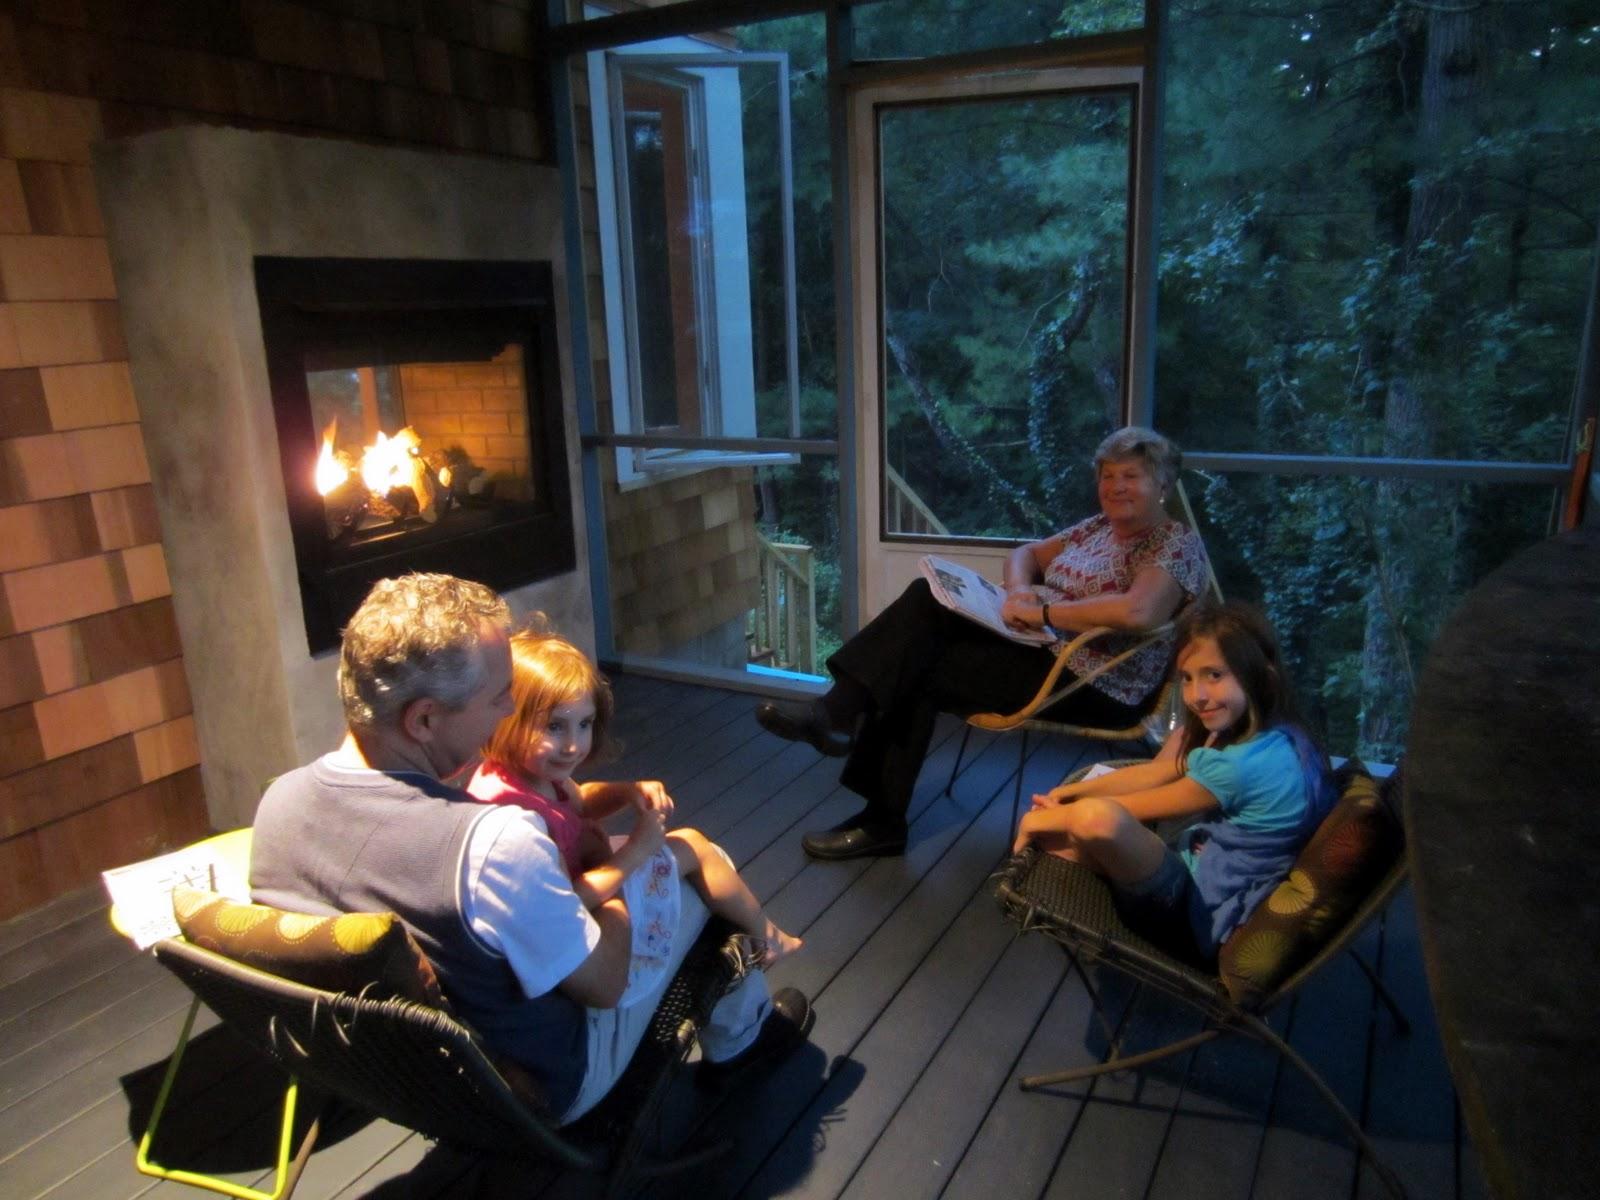 Gio Gio Design: Heat-N-Glo Twilight II Indoor Outdoor Gas Fireplace